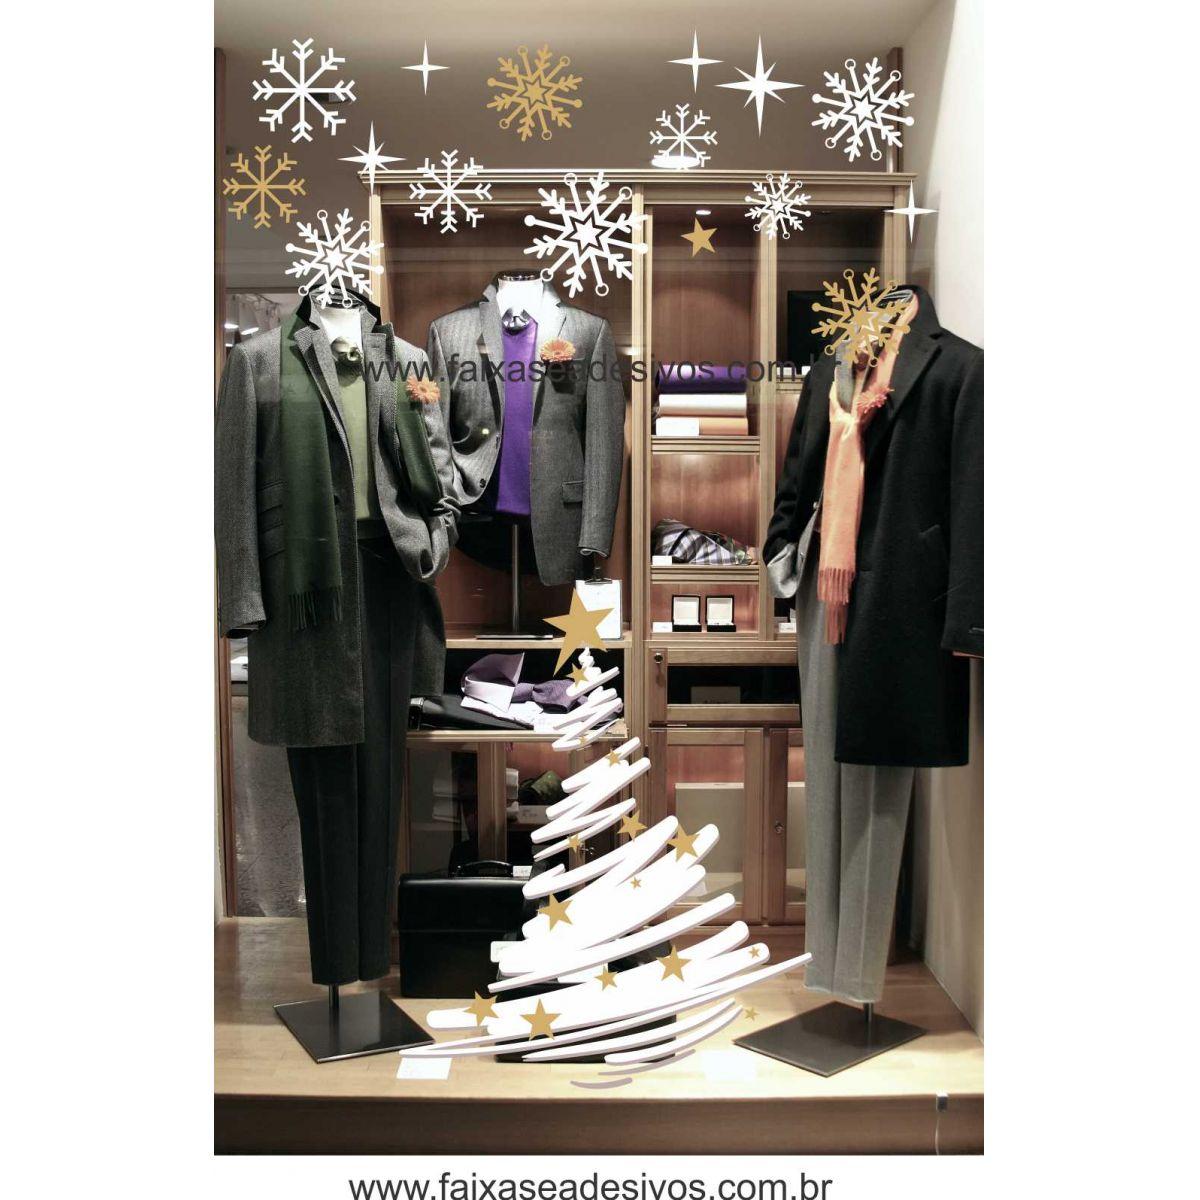 1232 - Adesivo Arvore de Natal com Neve - Cartela  - Fac Signs